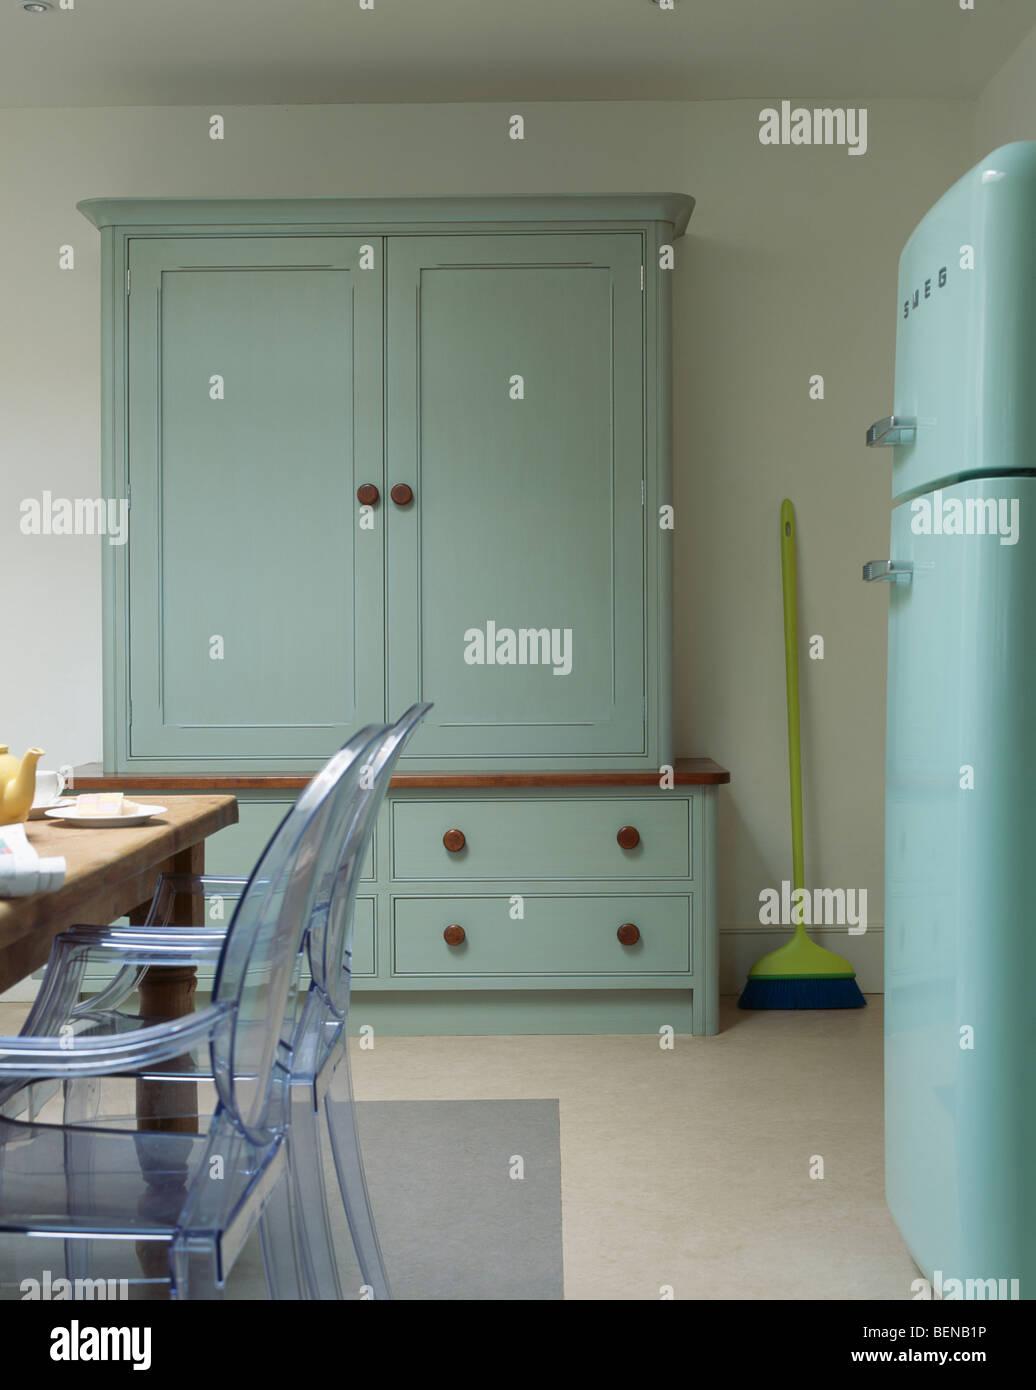 Interiors Kitchens Traditional Dressers Stock Photos & Interiors ...